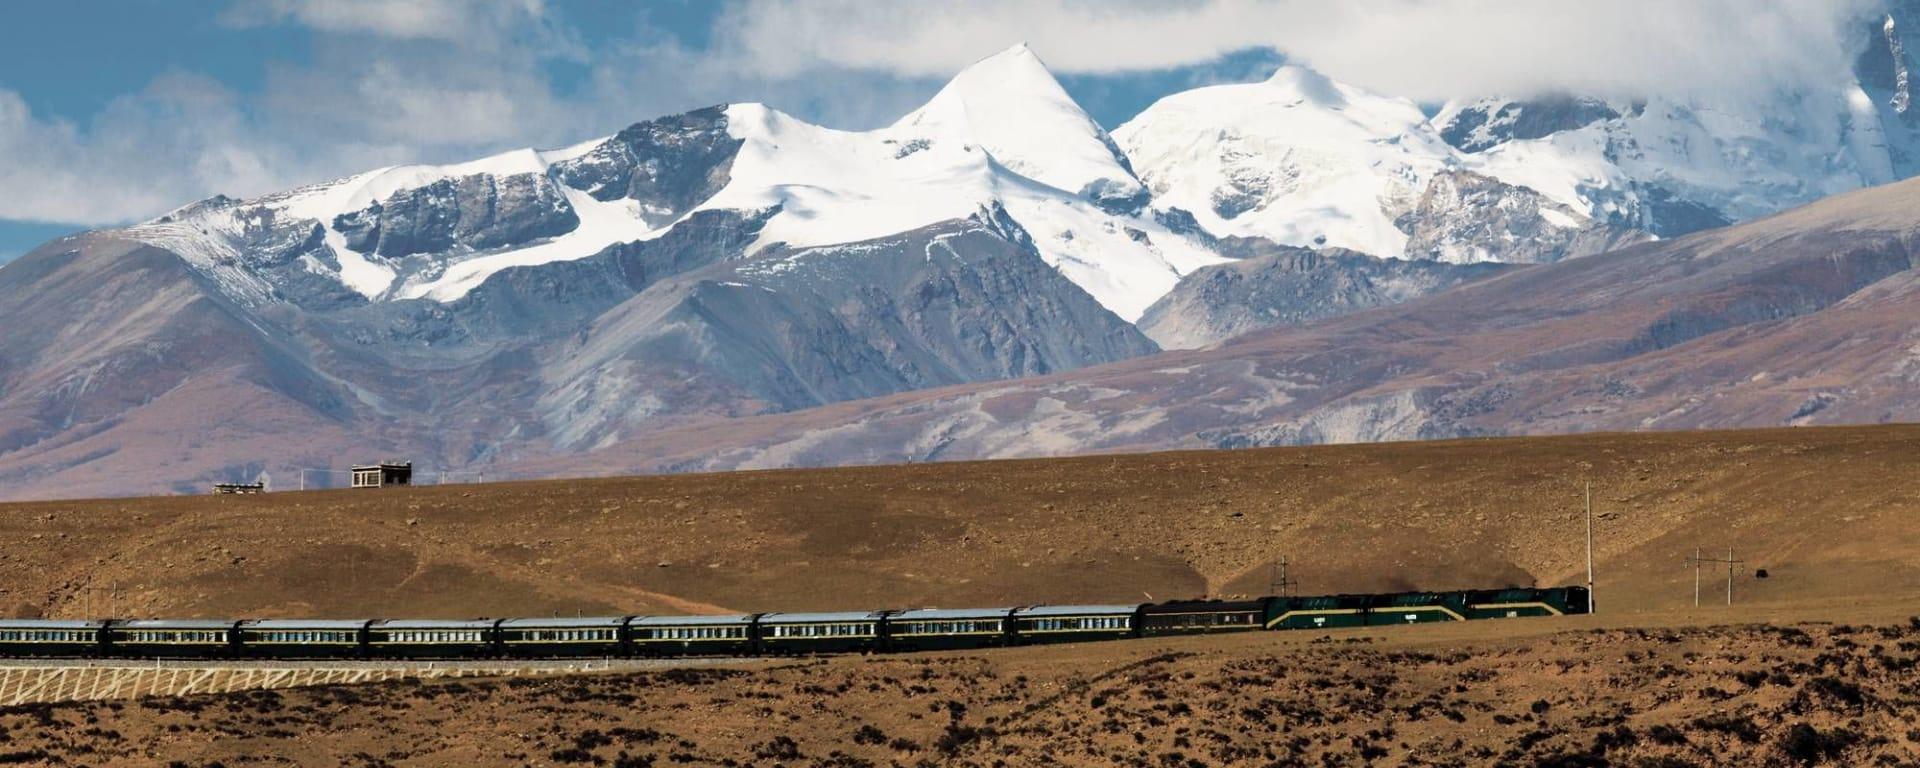 Circuit spectaculaire du Yunnan au Tibet de Kunming: Tibet Train Nyenchen Tanglha Mountains